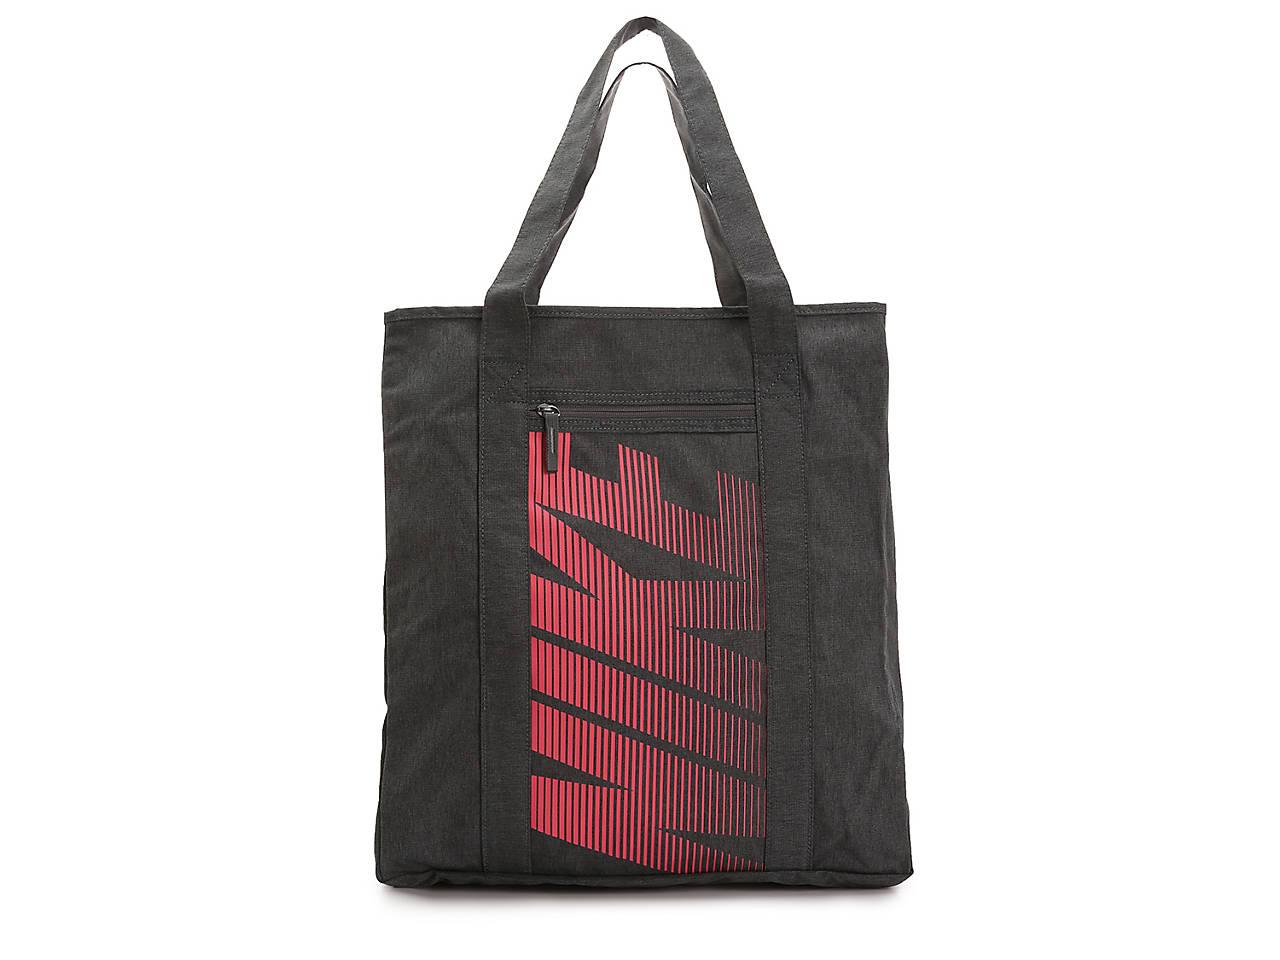 b0569fda2d2d0 Nike Gym Training Tote Women s Handbags   Accessories